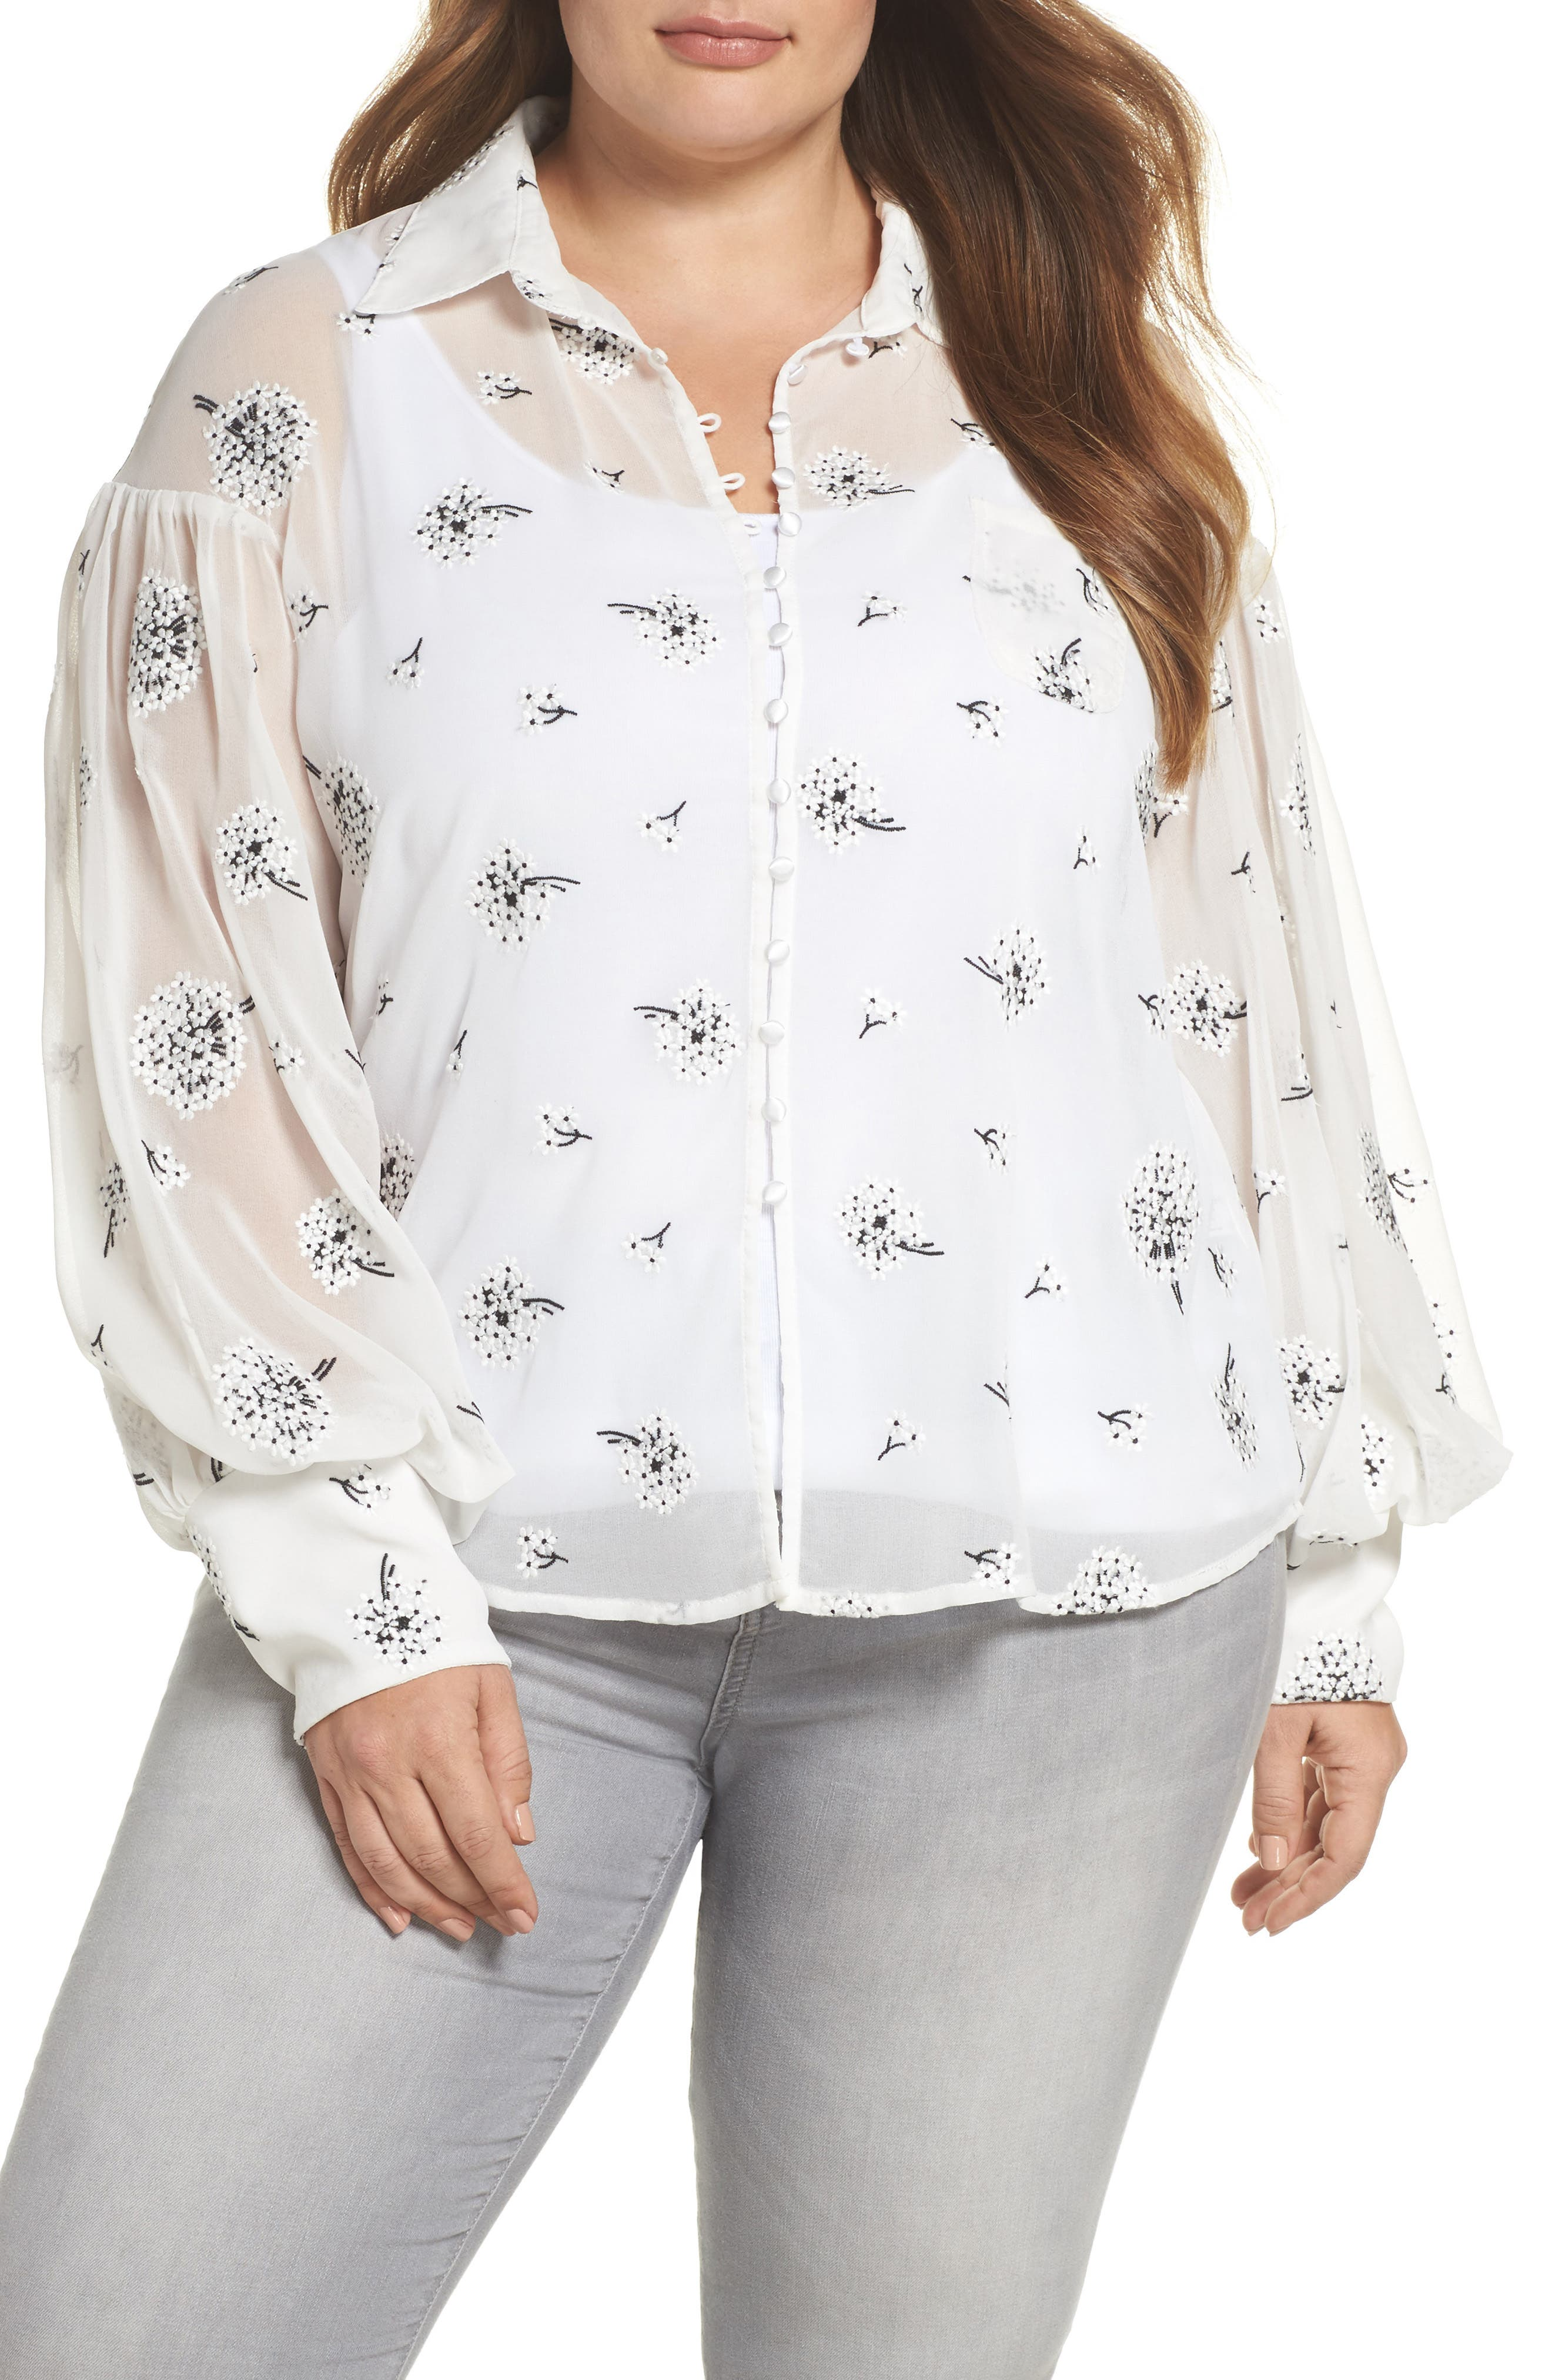 ELVI The Dandelion Conversational Embroidered Blouse (Regular & Plus Size)